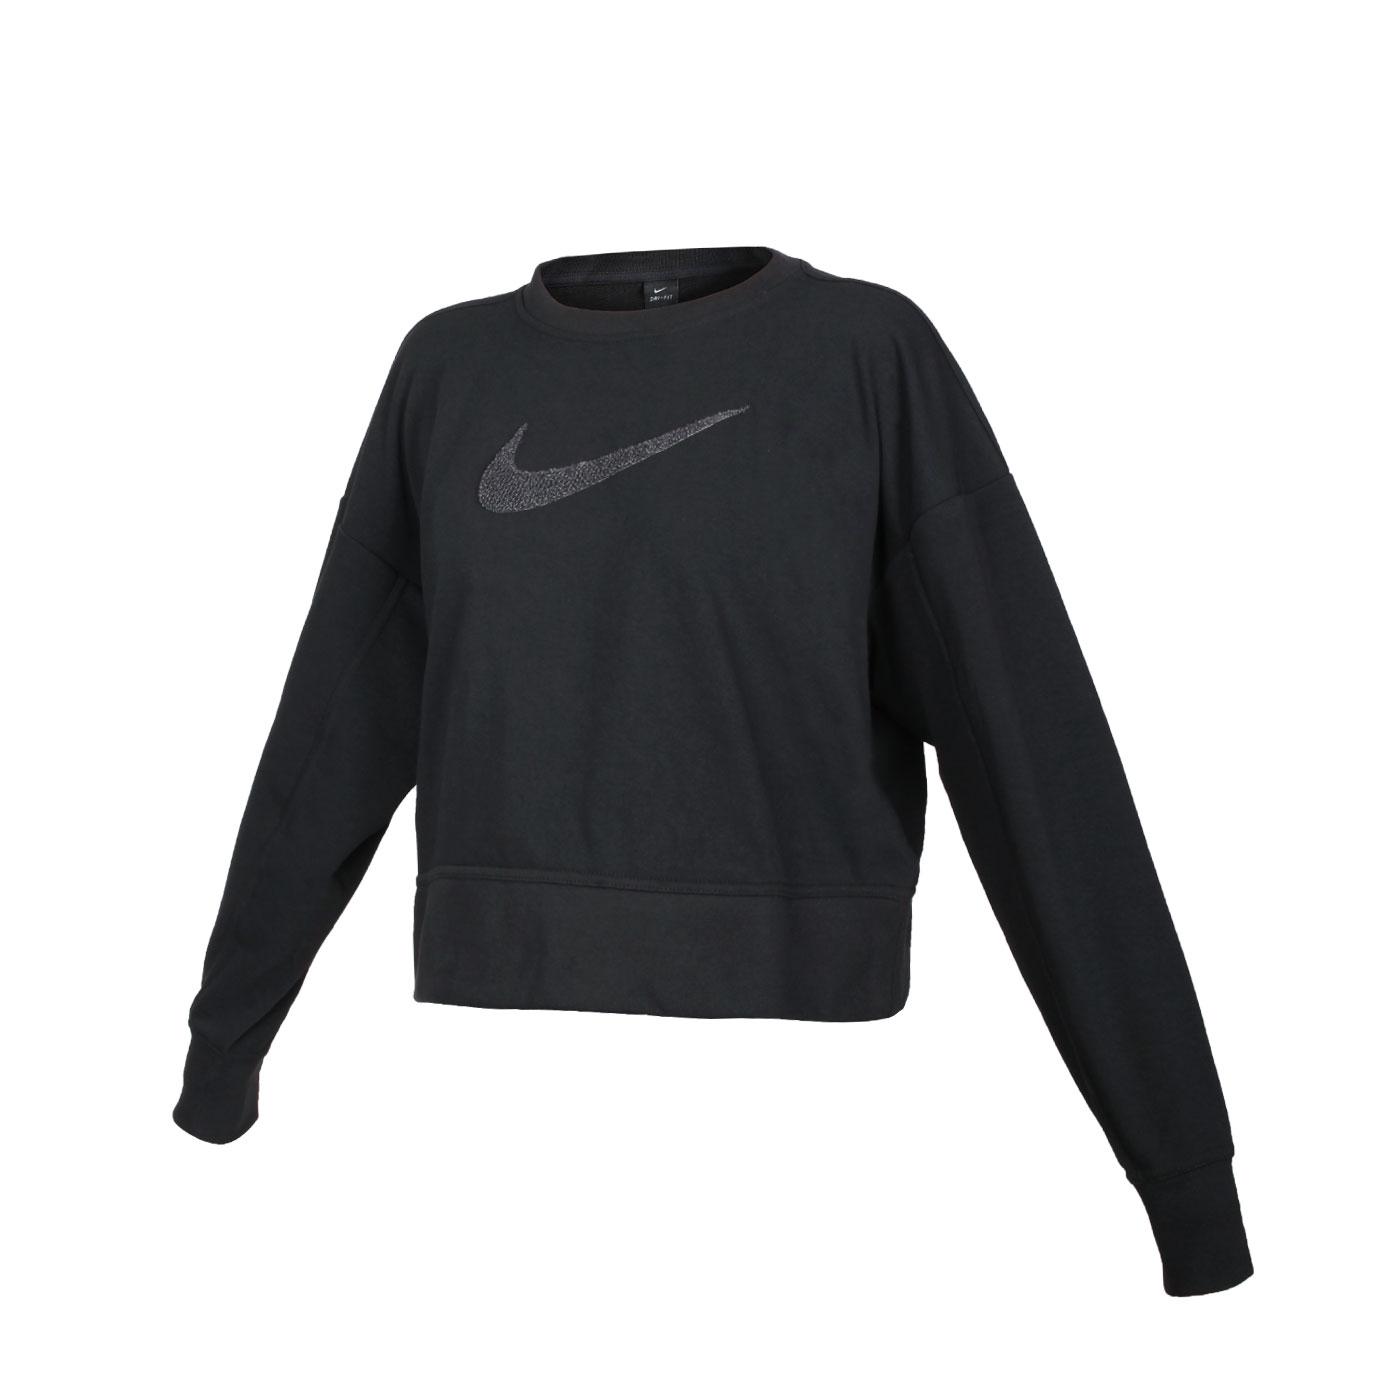 NIKE 女款休閒長袖T恤 CU5507-010 - 黑